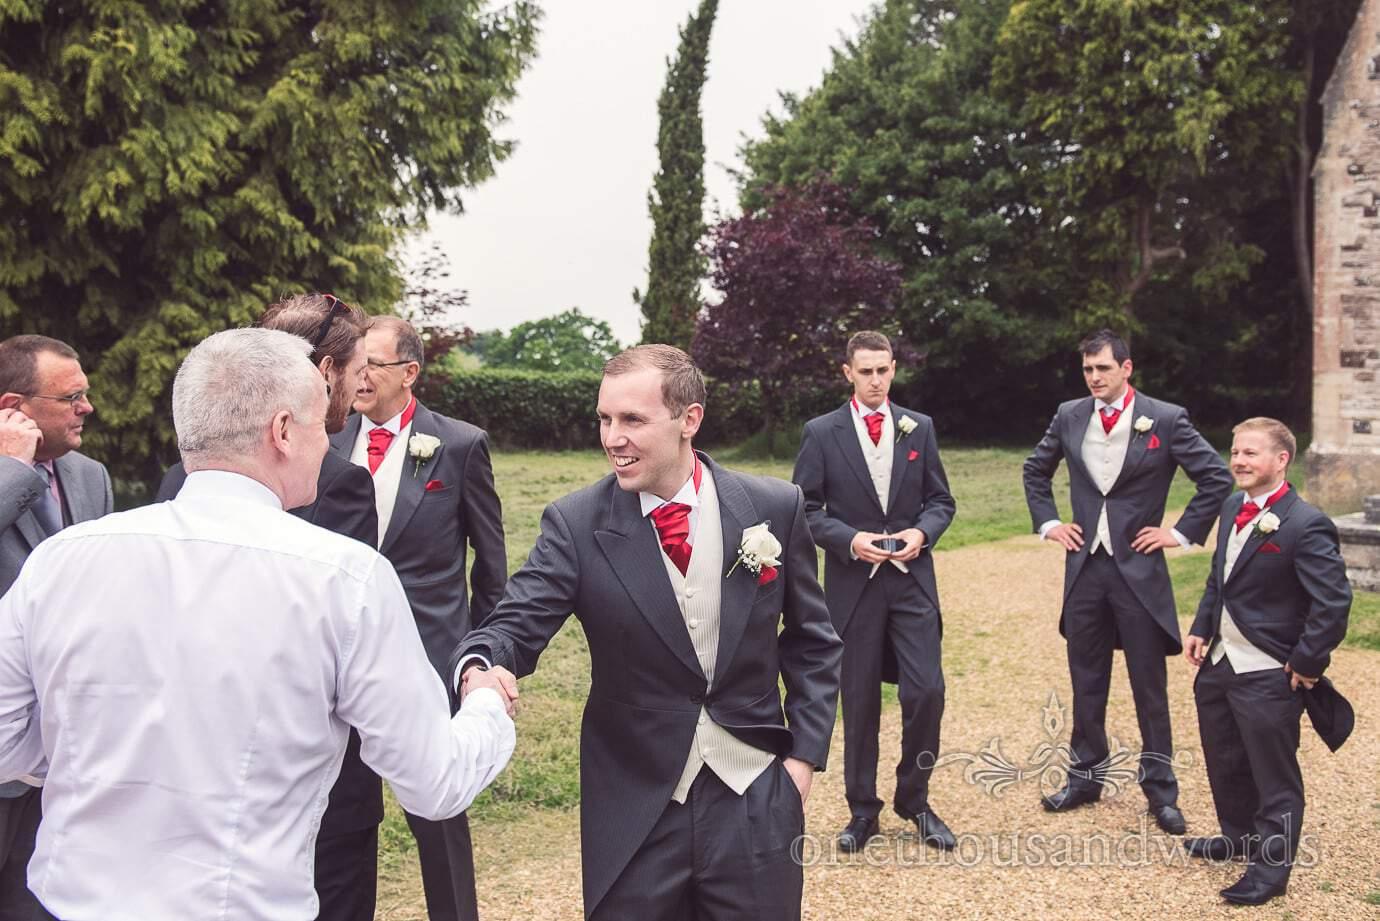 Groom and groomsmen greet wedding guests outside Dorset Church